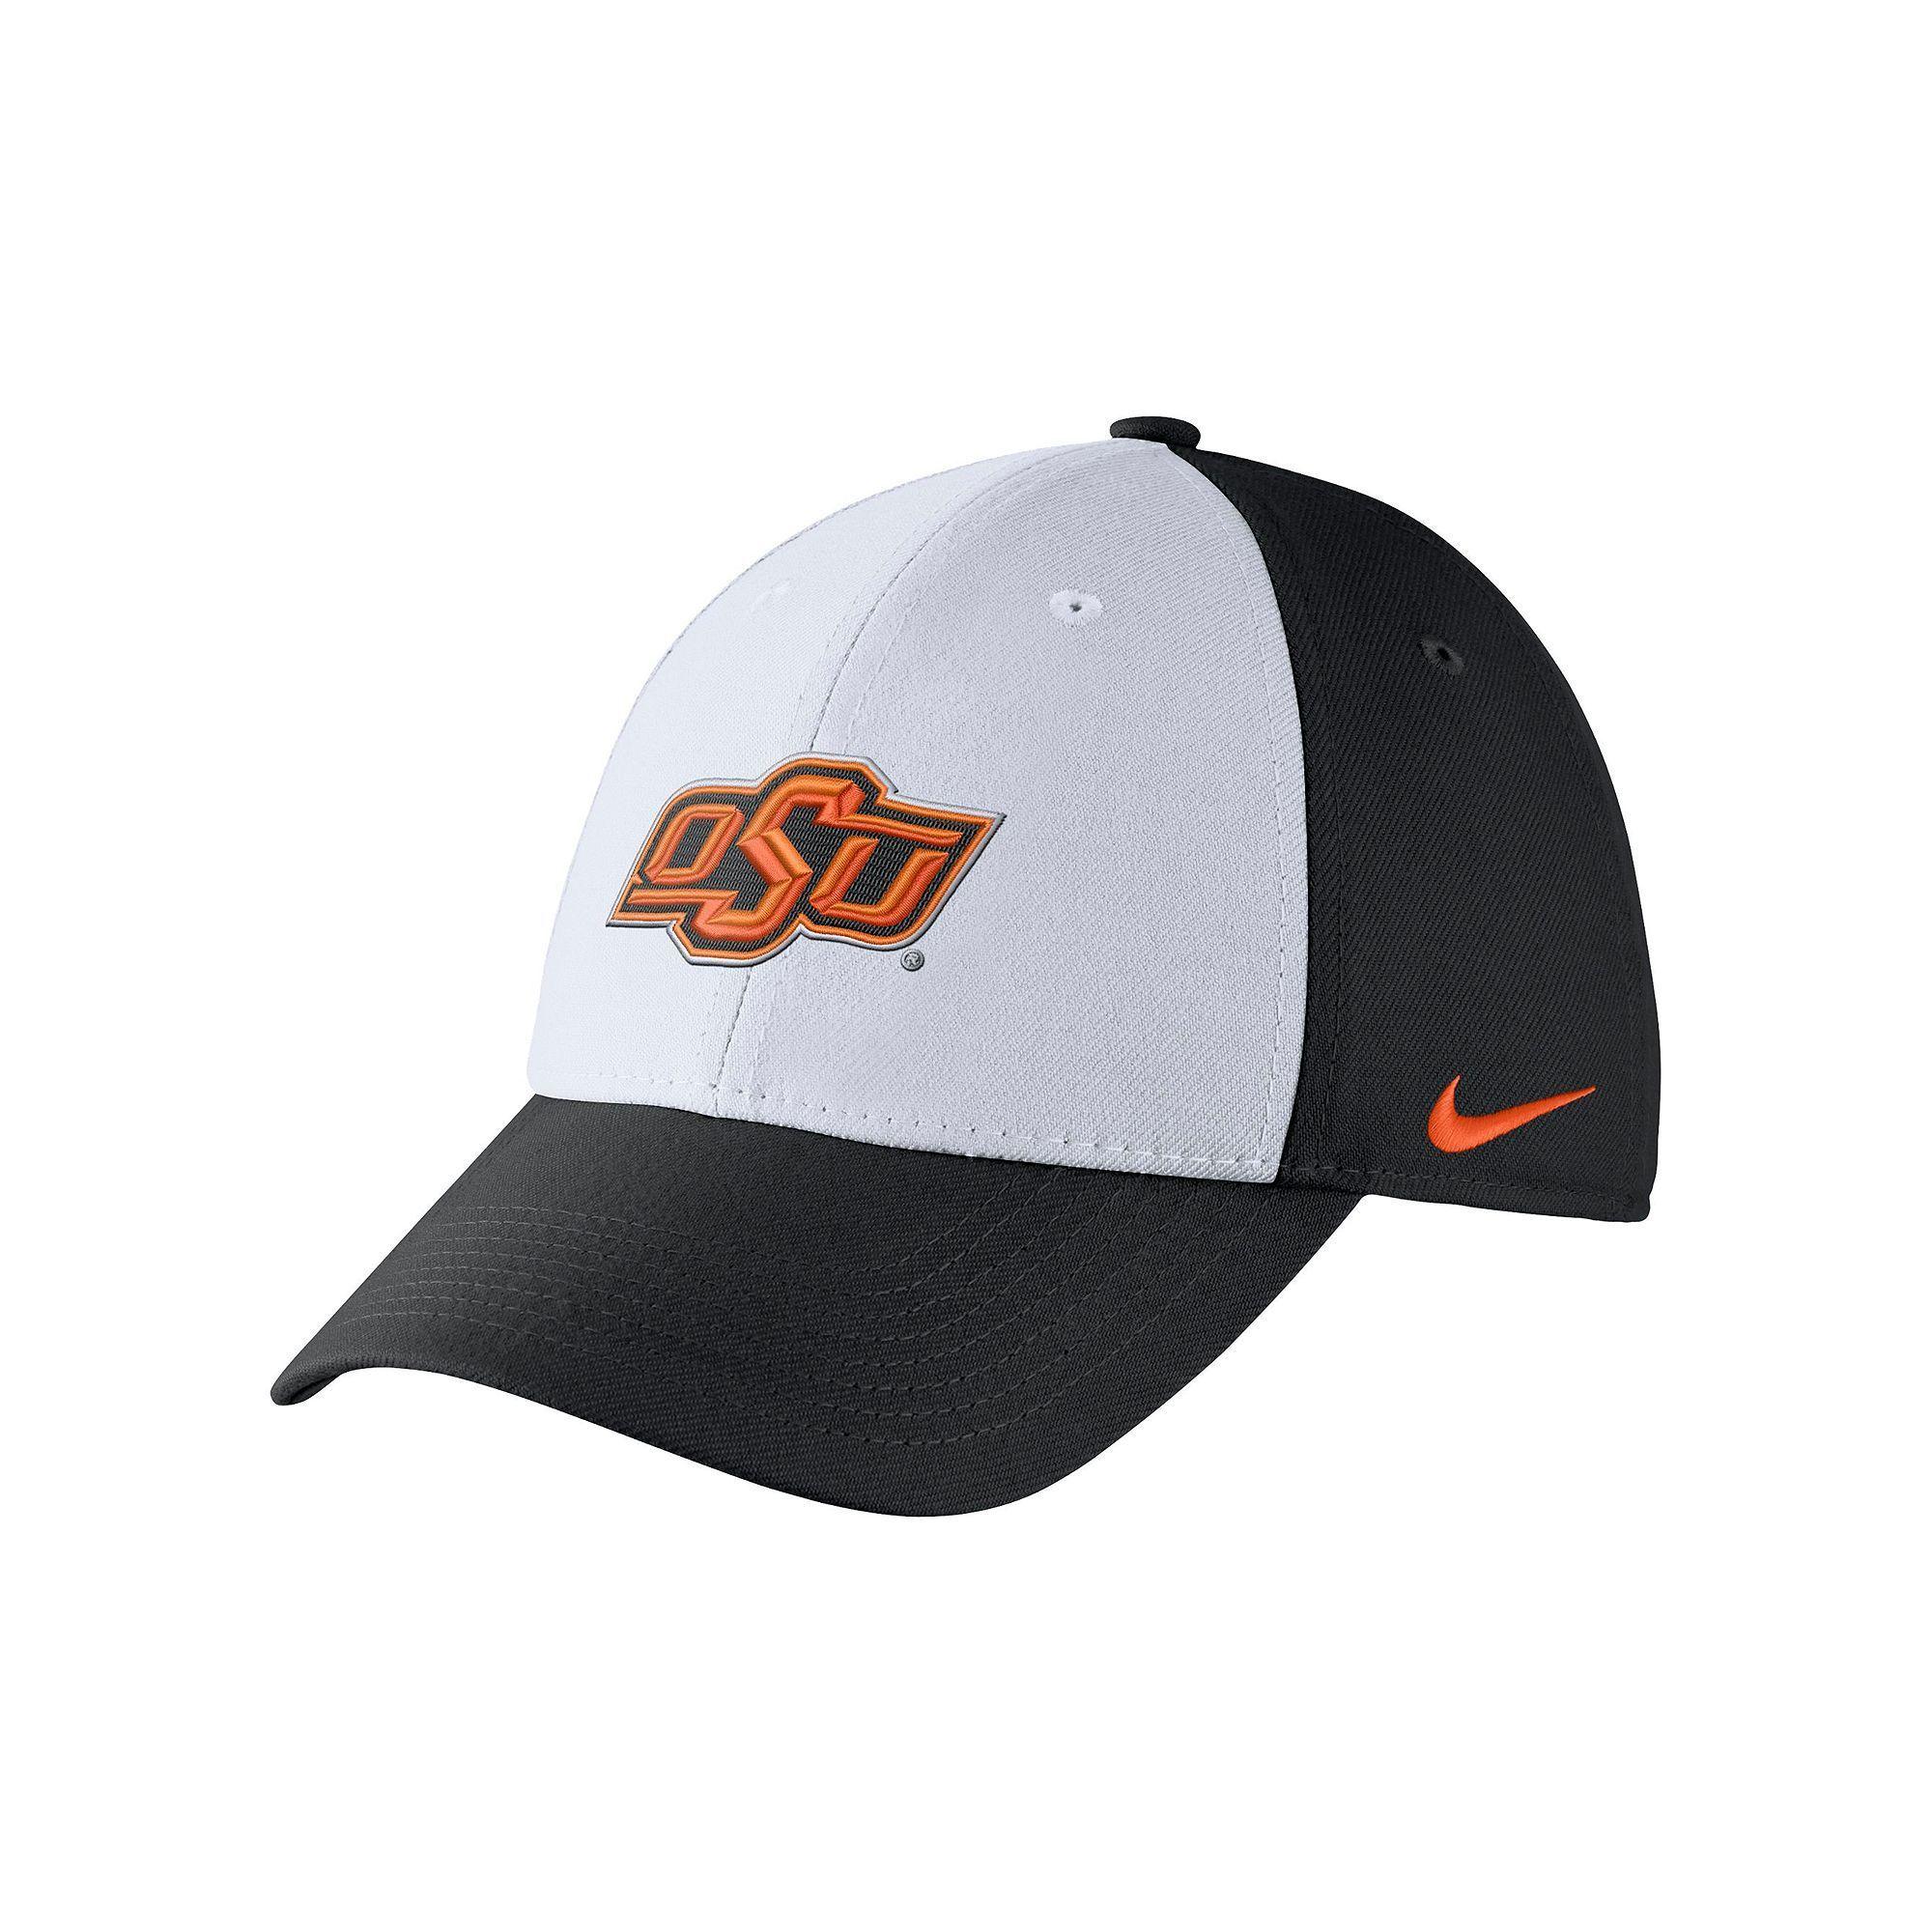 9f5830a8c1e56 Men s Nike Oklahoma State Cowboys Dri-FIT Flex-Fit Cap